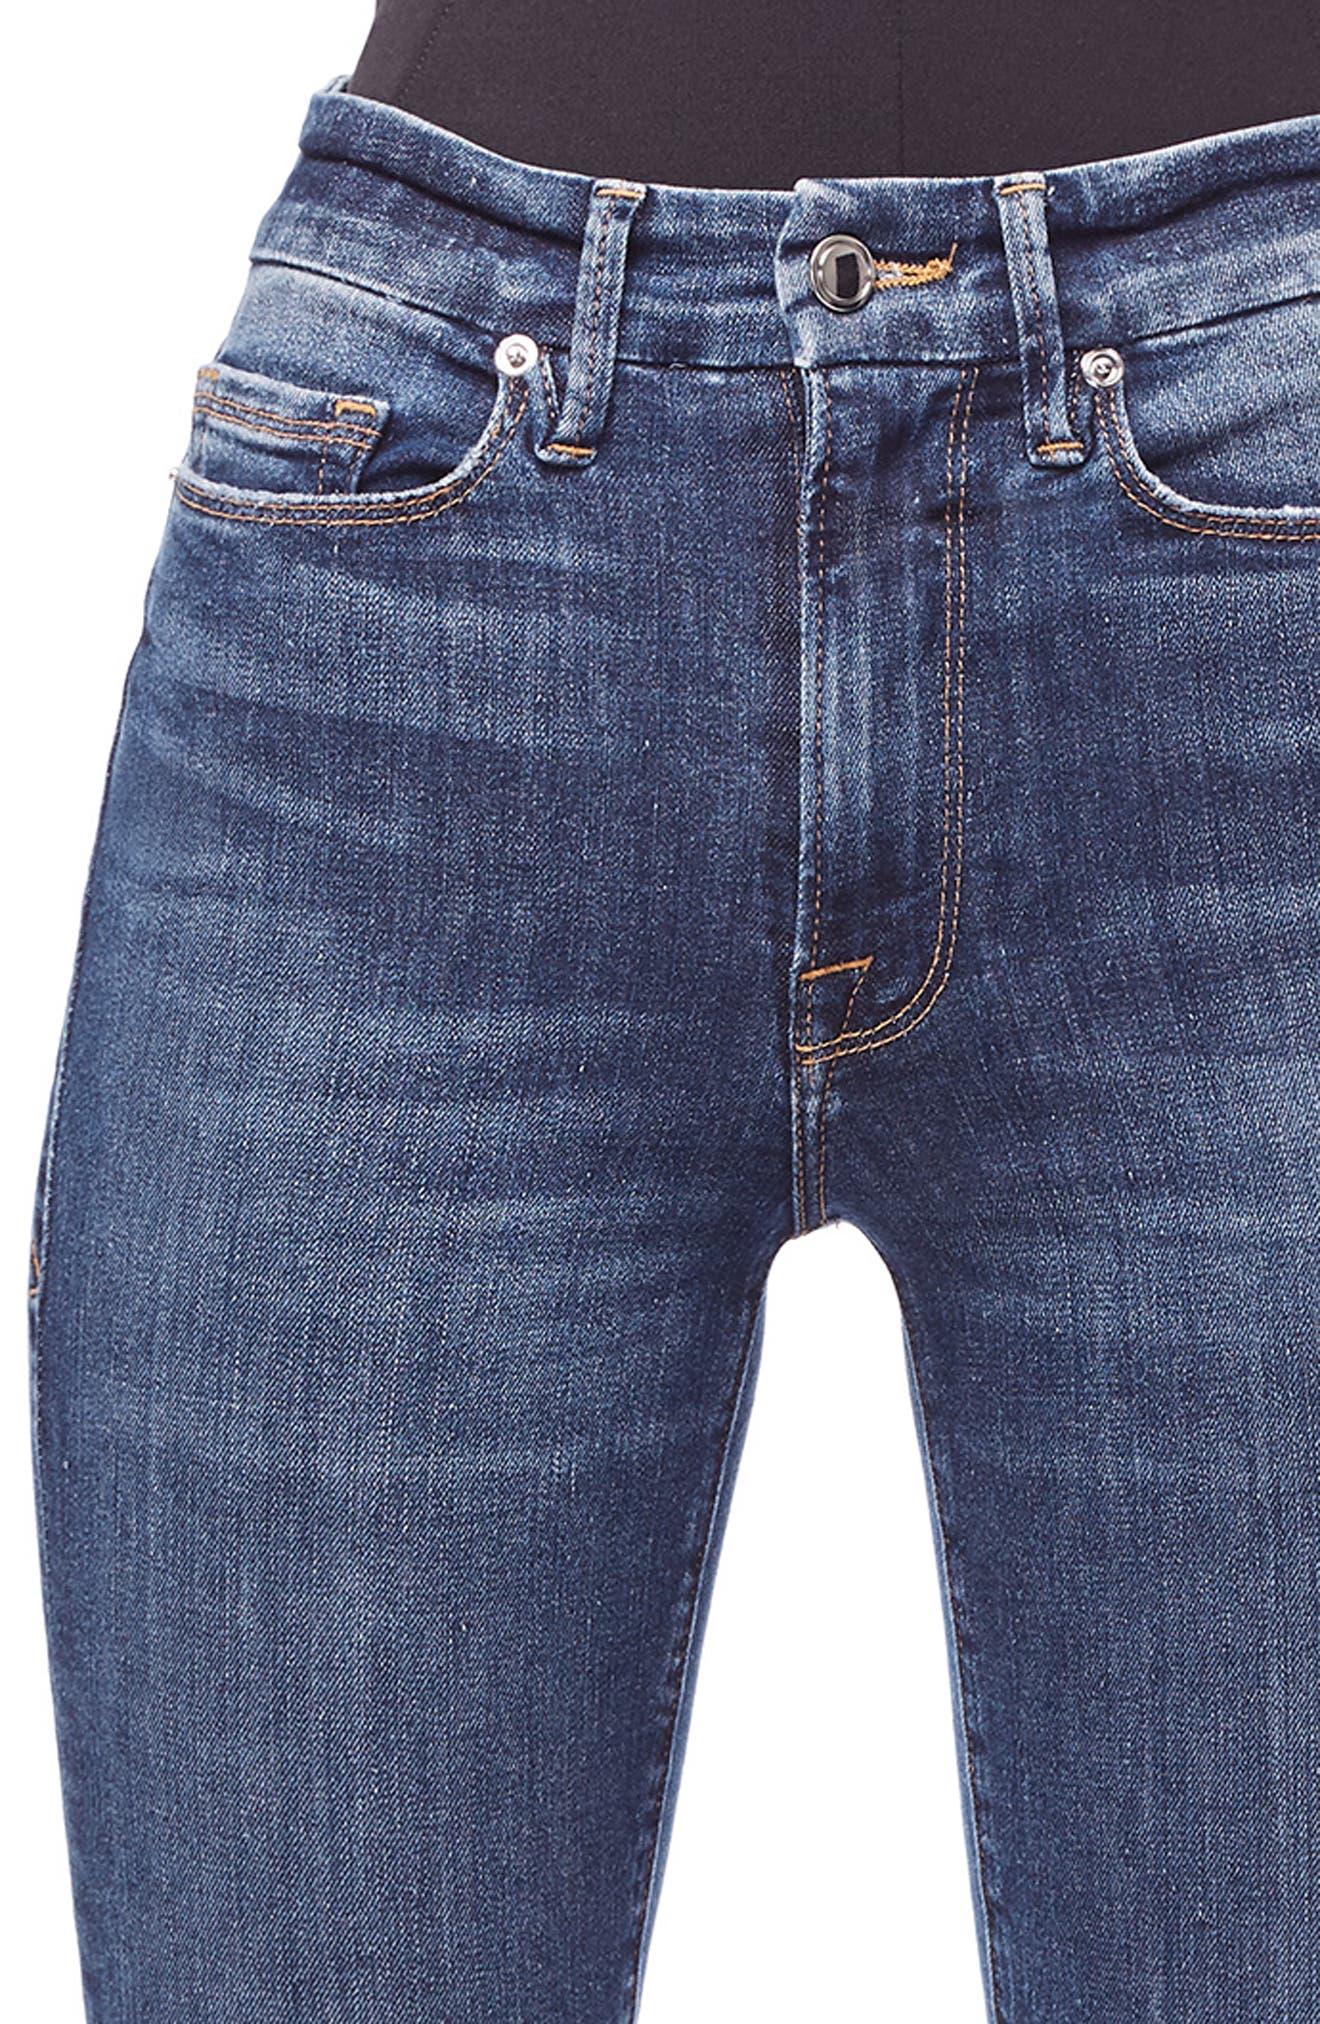 GOOD AMERICAN, Good Waist Ripped High Waist Skinny Jeans, Alternate thumbnail 6, color, BLUE 195